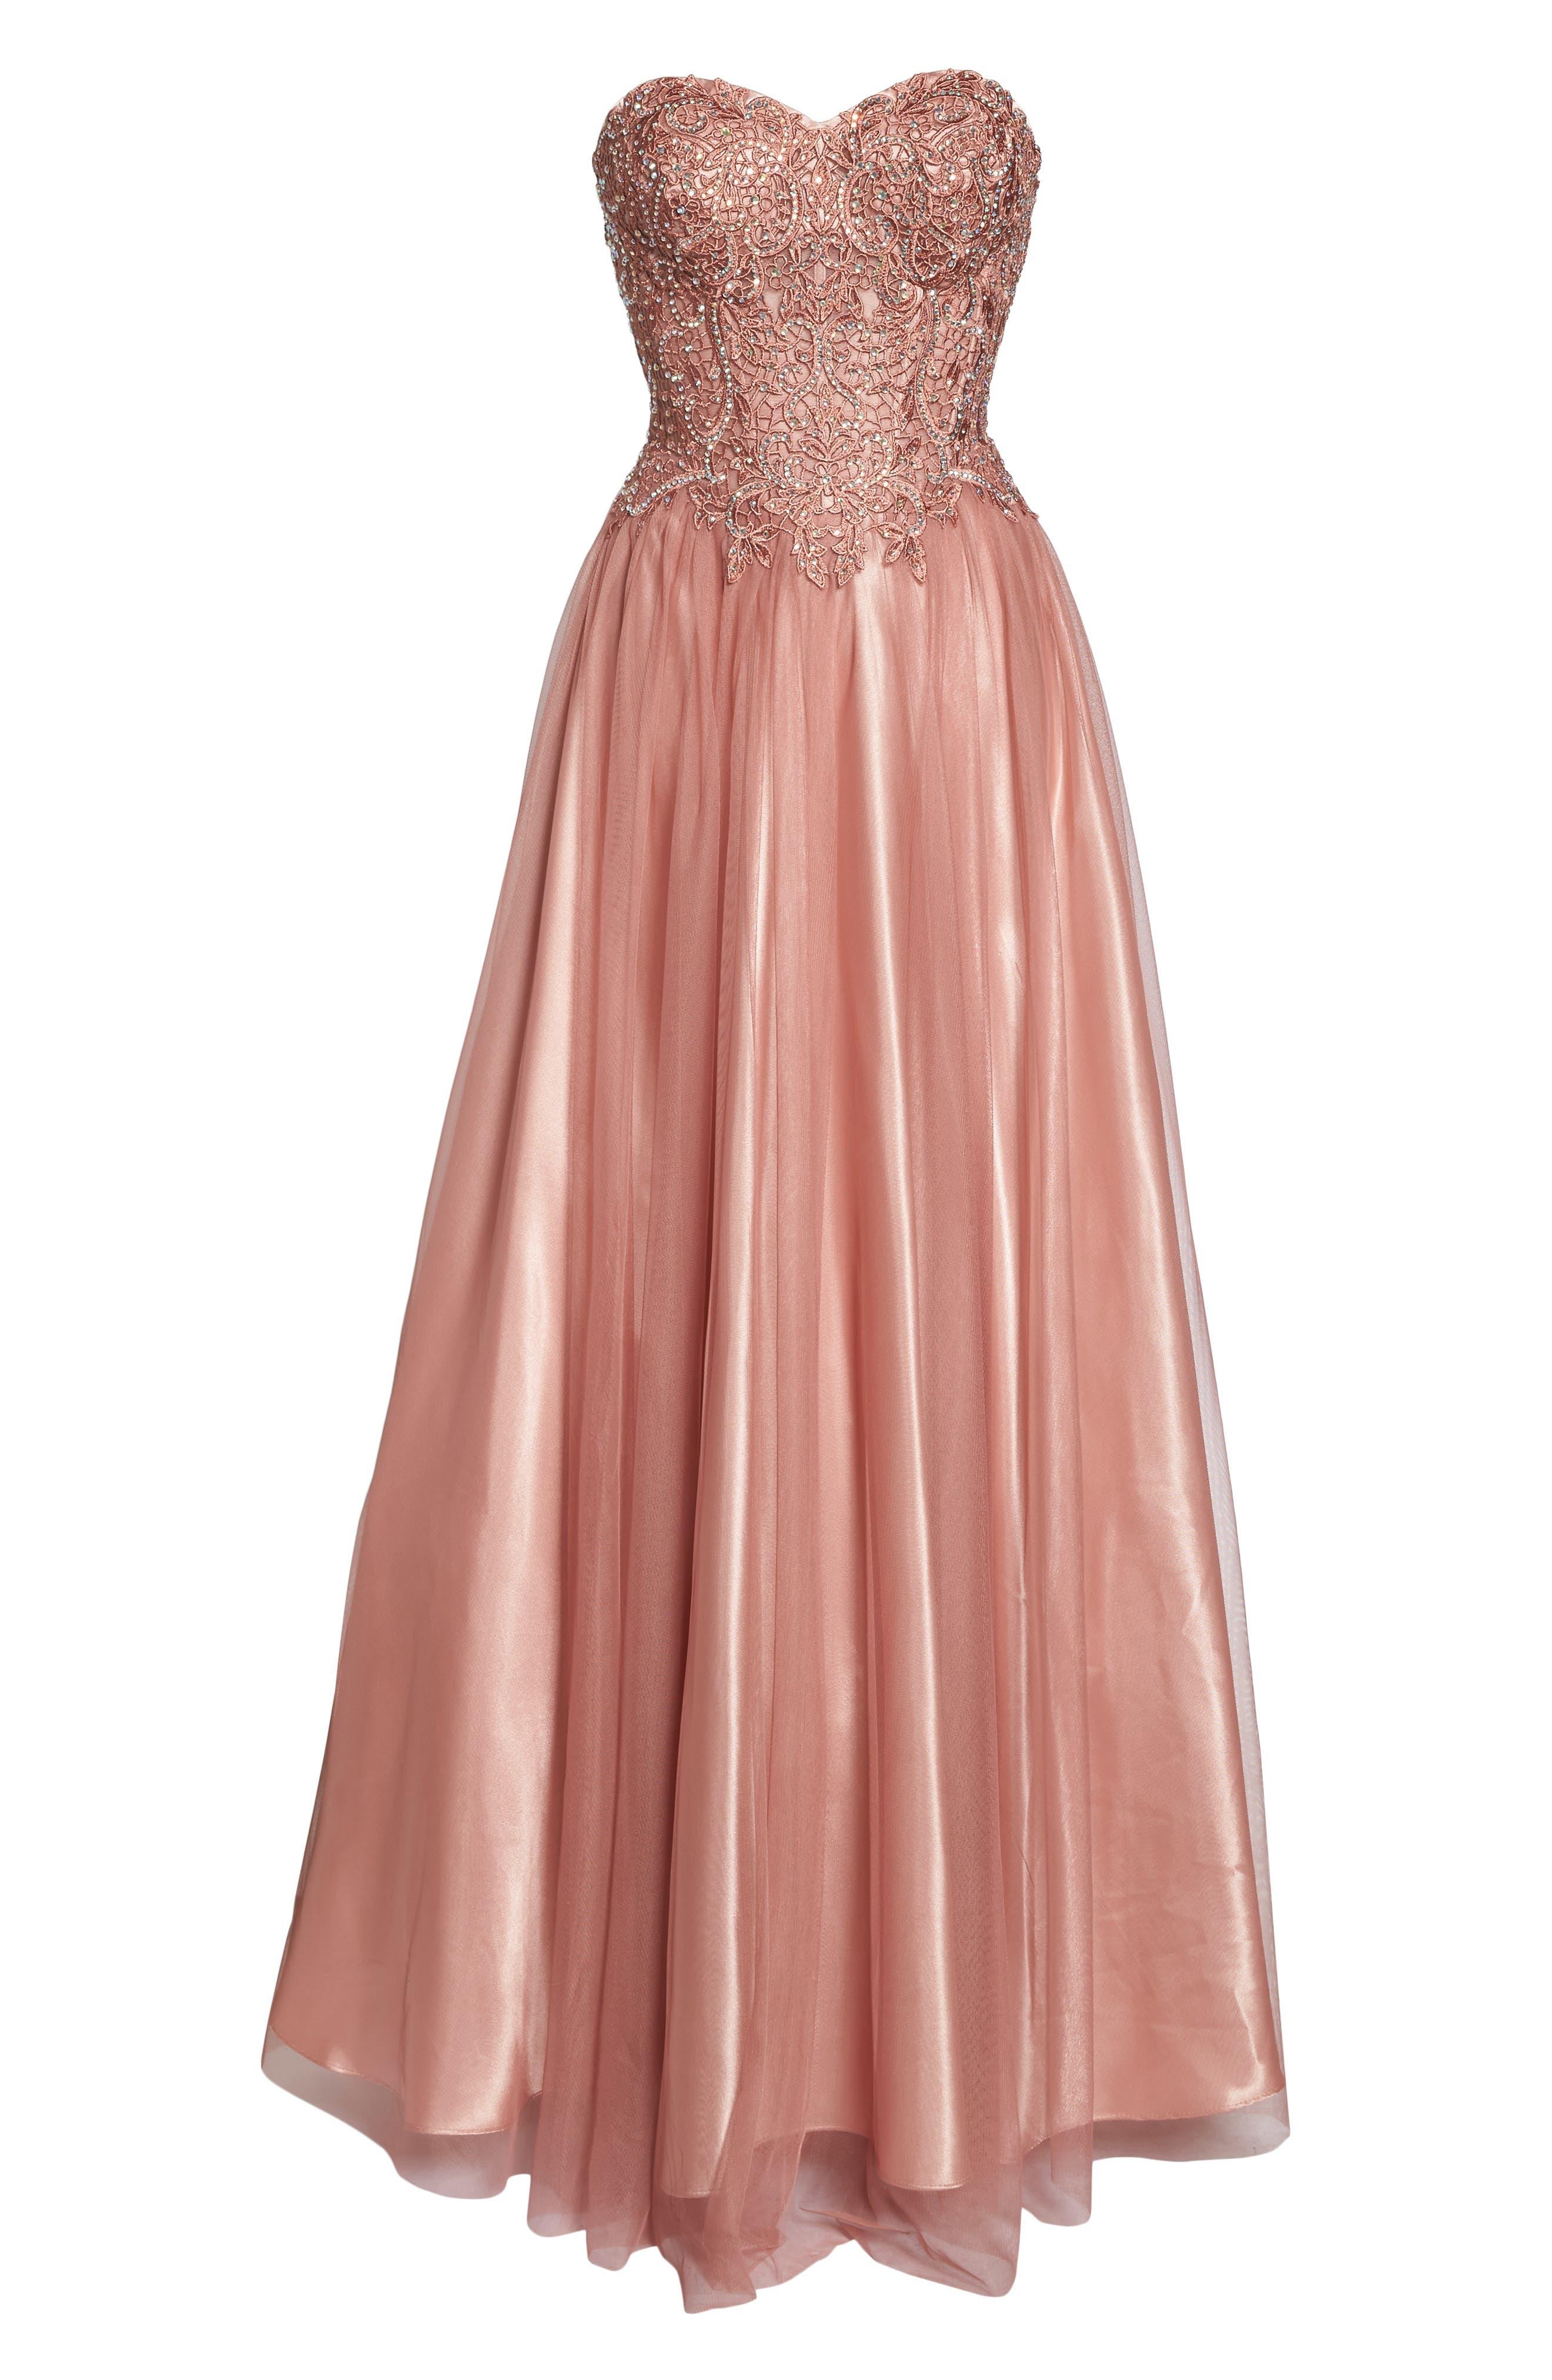 Embellished Corset Ballgown,                             Alternate thumbnail 6, color,                             Rose